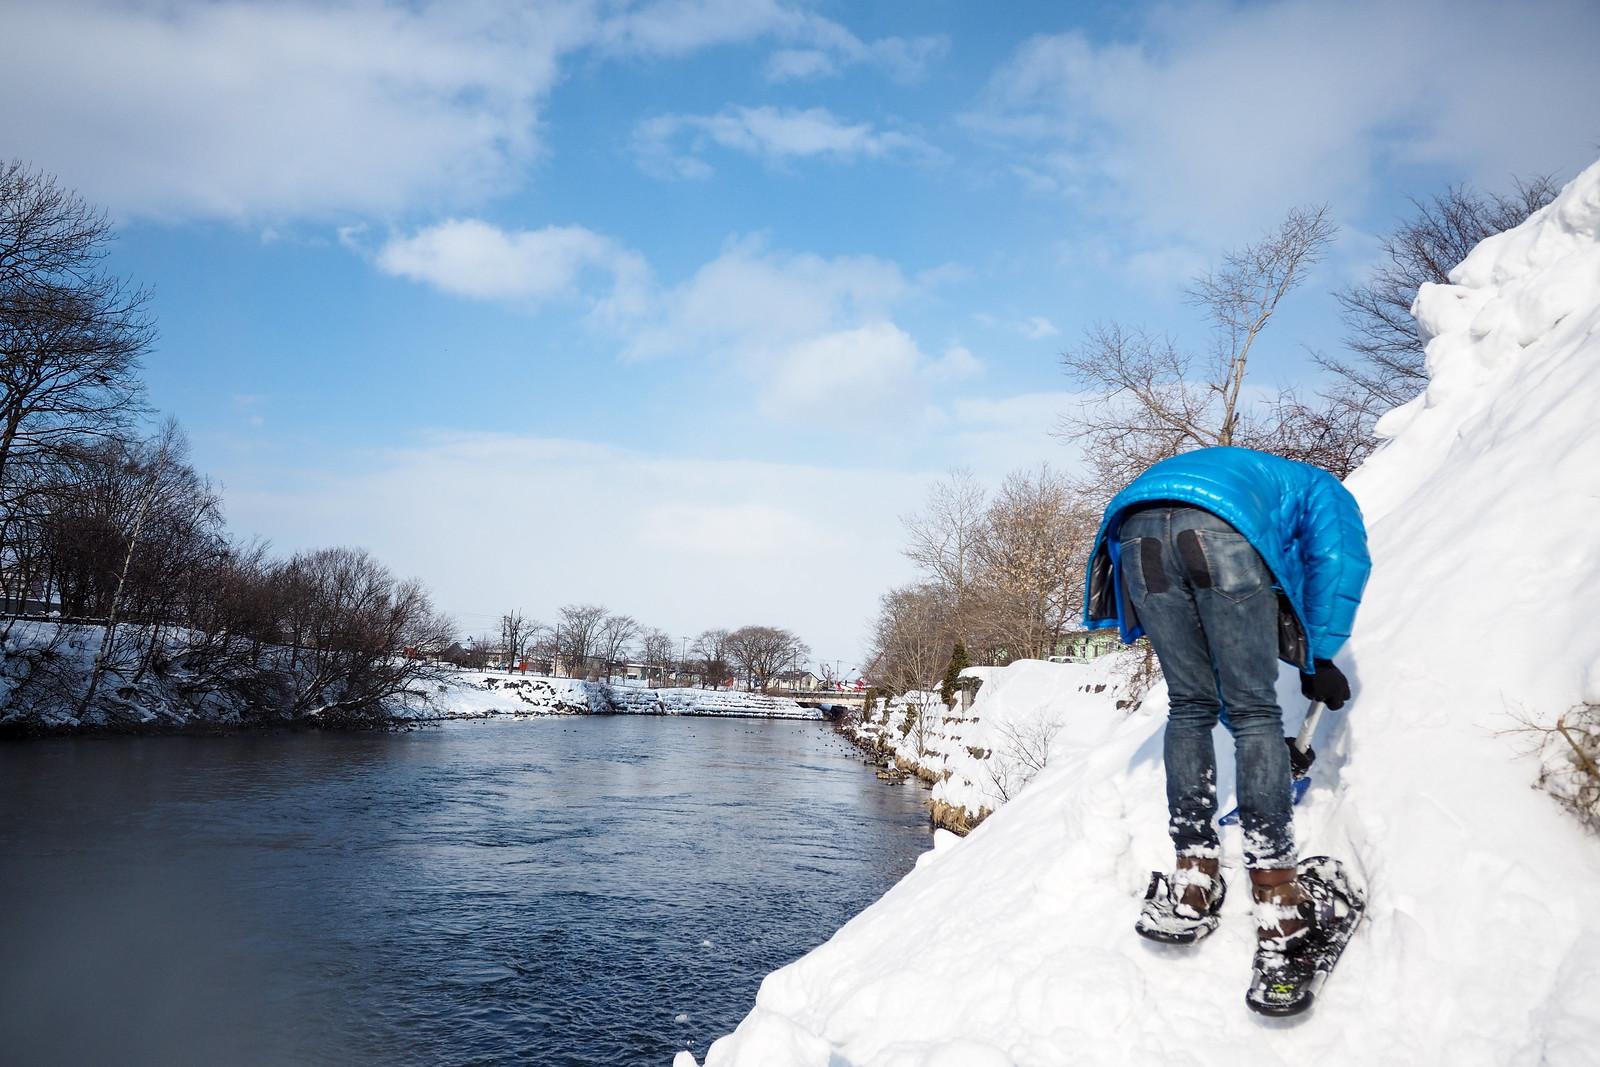 Snowshoeing along the Chitose River (Hokkaido, Japan)